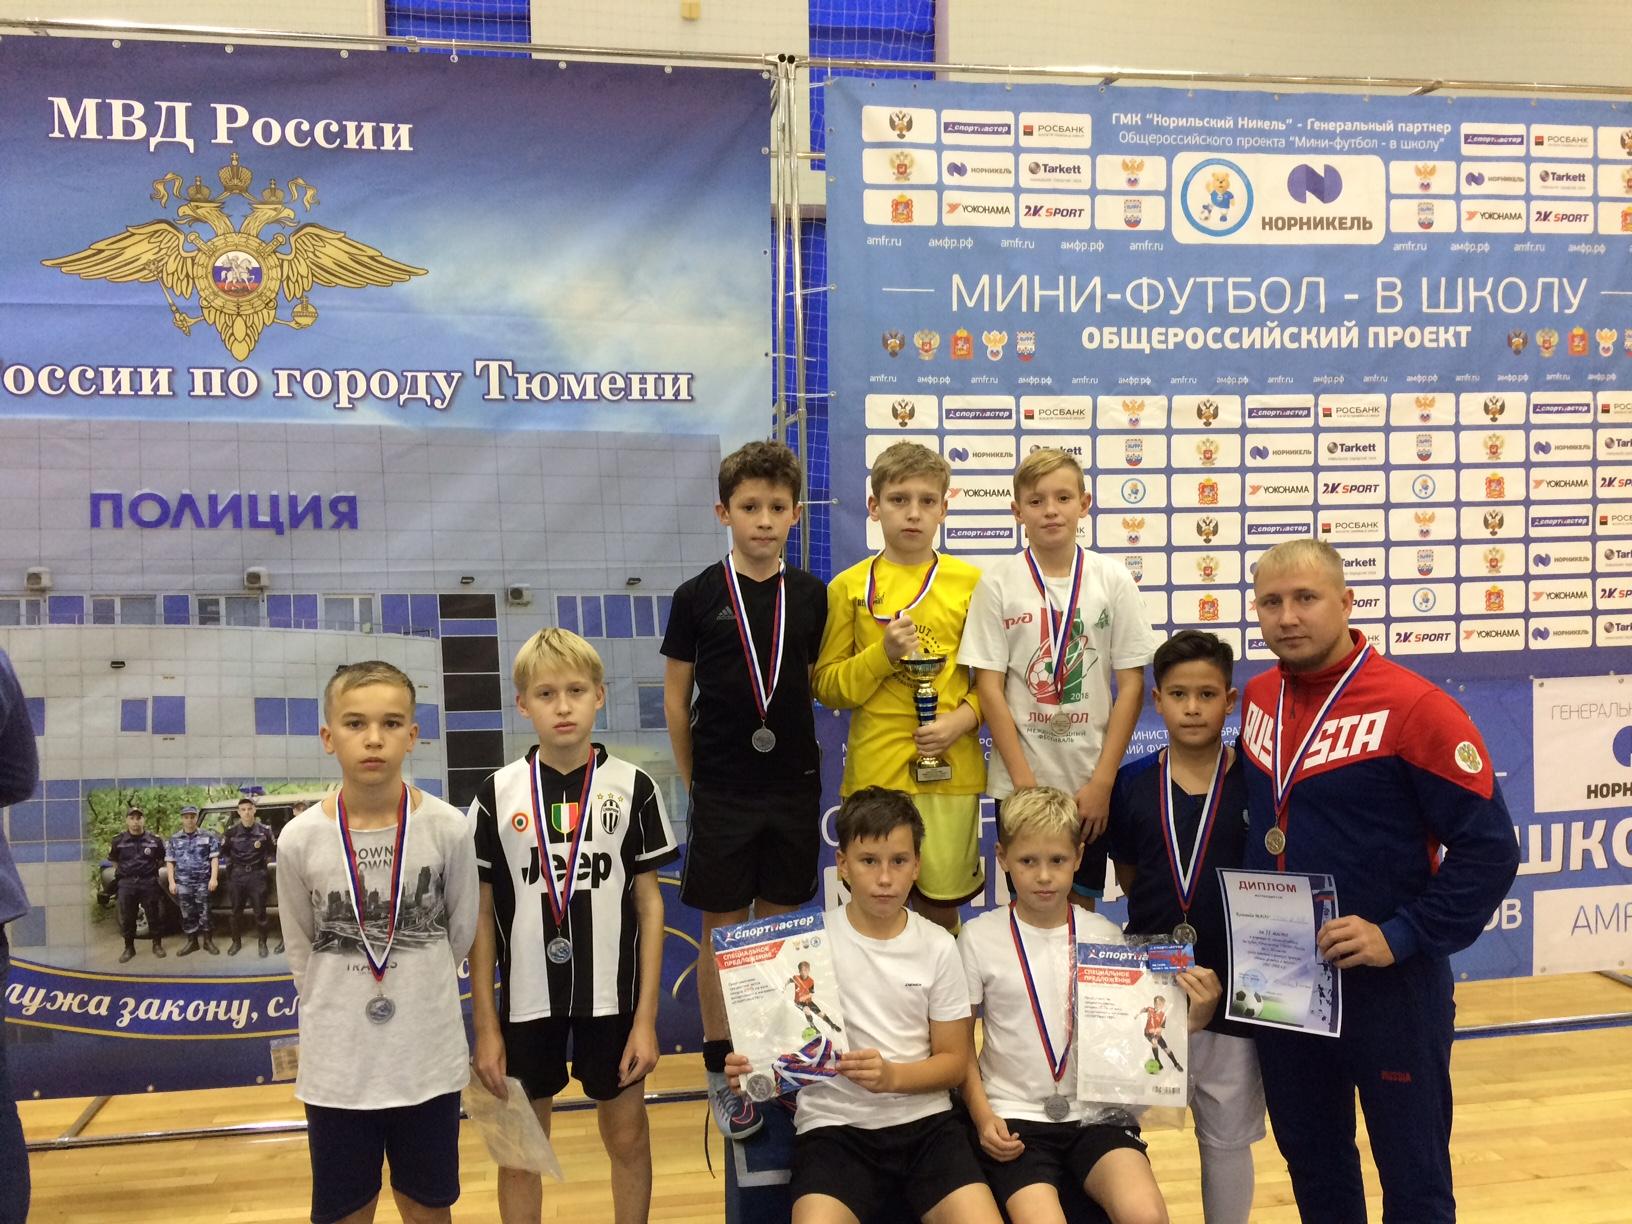 http://gymnasium49tyumen.ru/wp-content/uploads/2018/10/Мини-футбол.mov